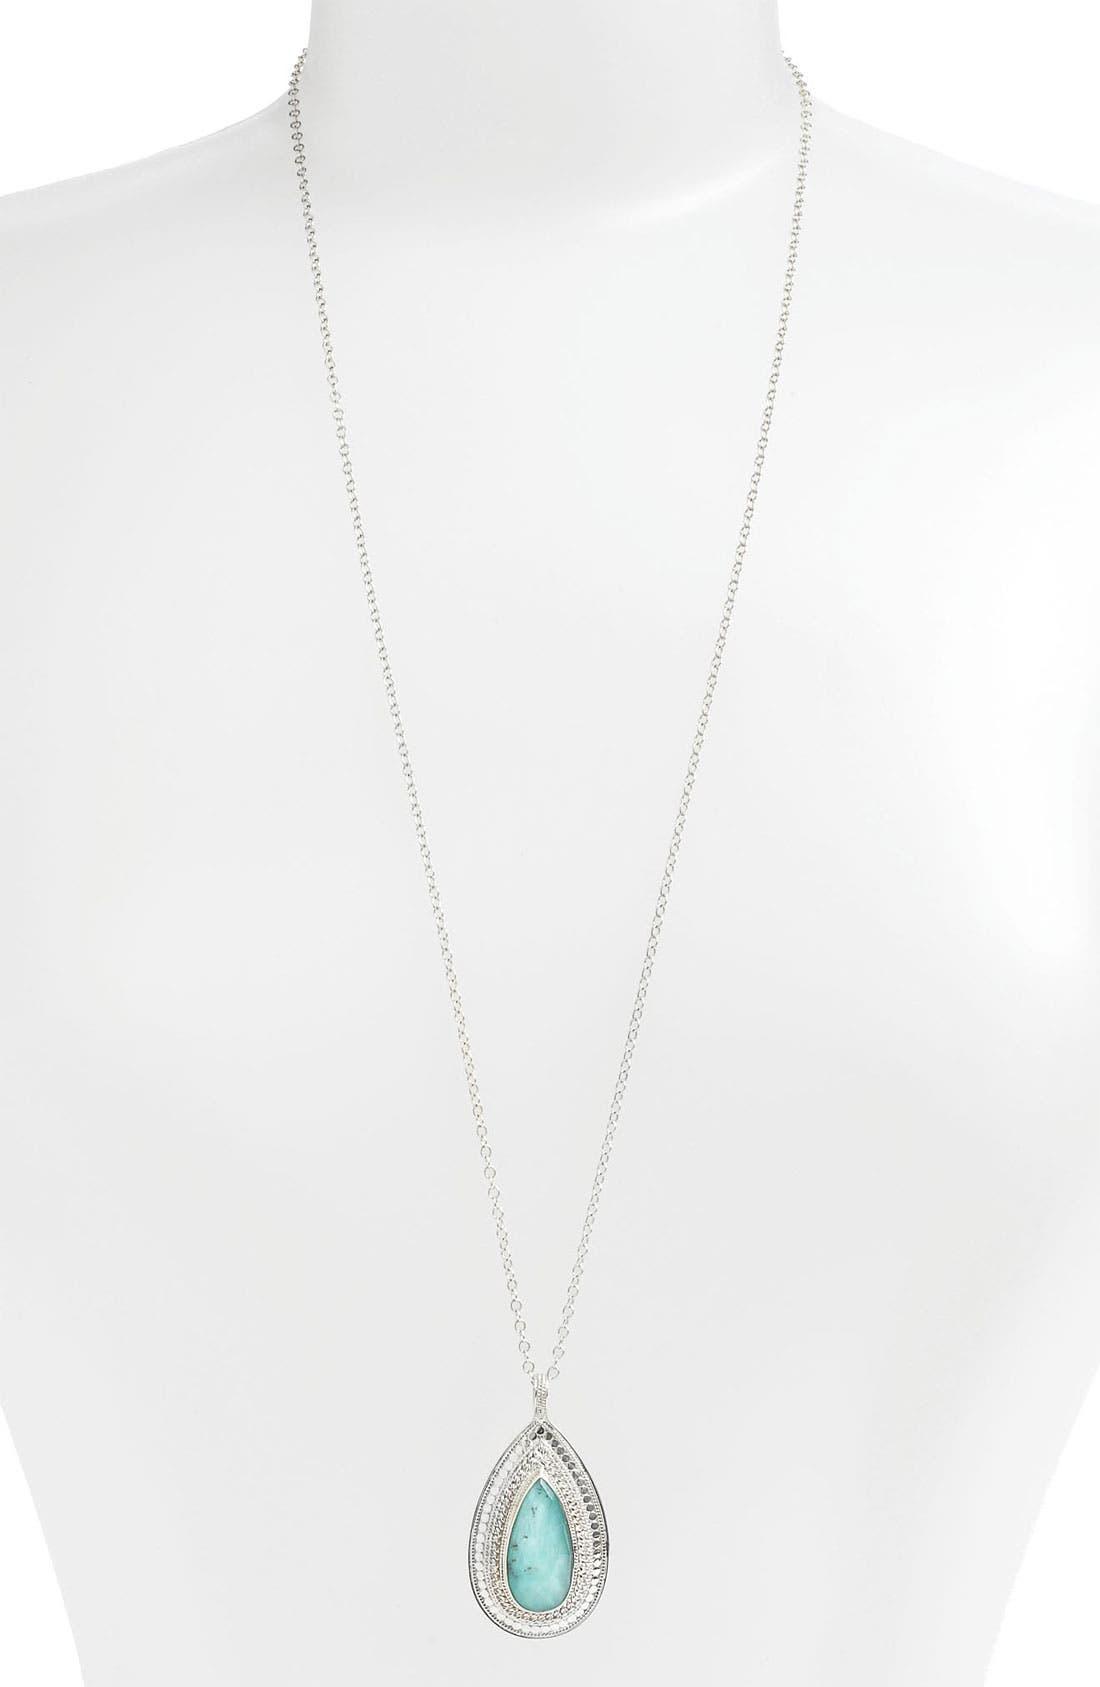 Alternate Image 1 Selected - Anna Beck 'Gili' Teardrop Pendant Necklace